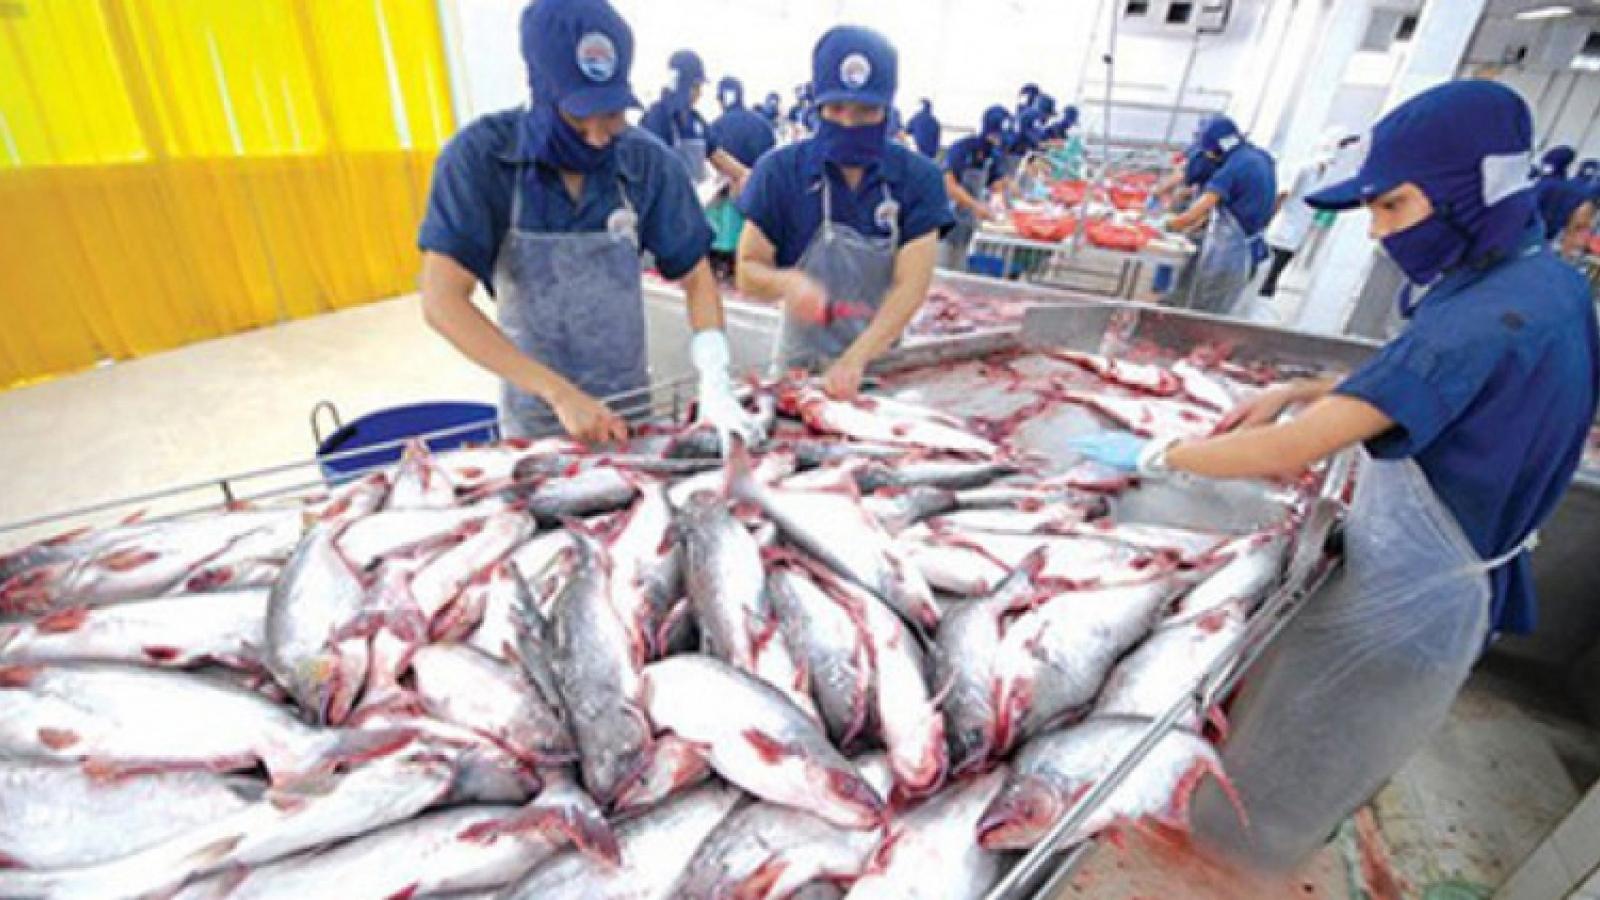 Cambodia lifts ban on catfish imports from Vietnam